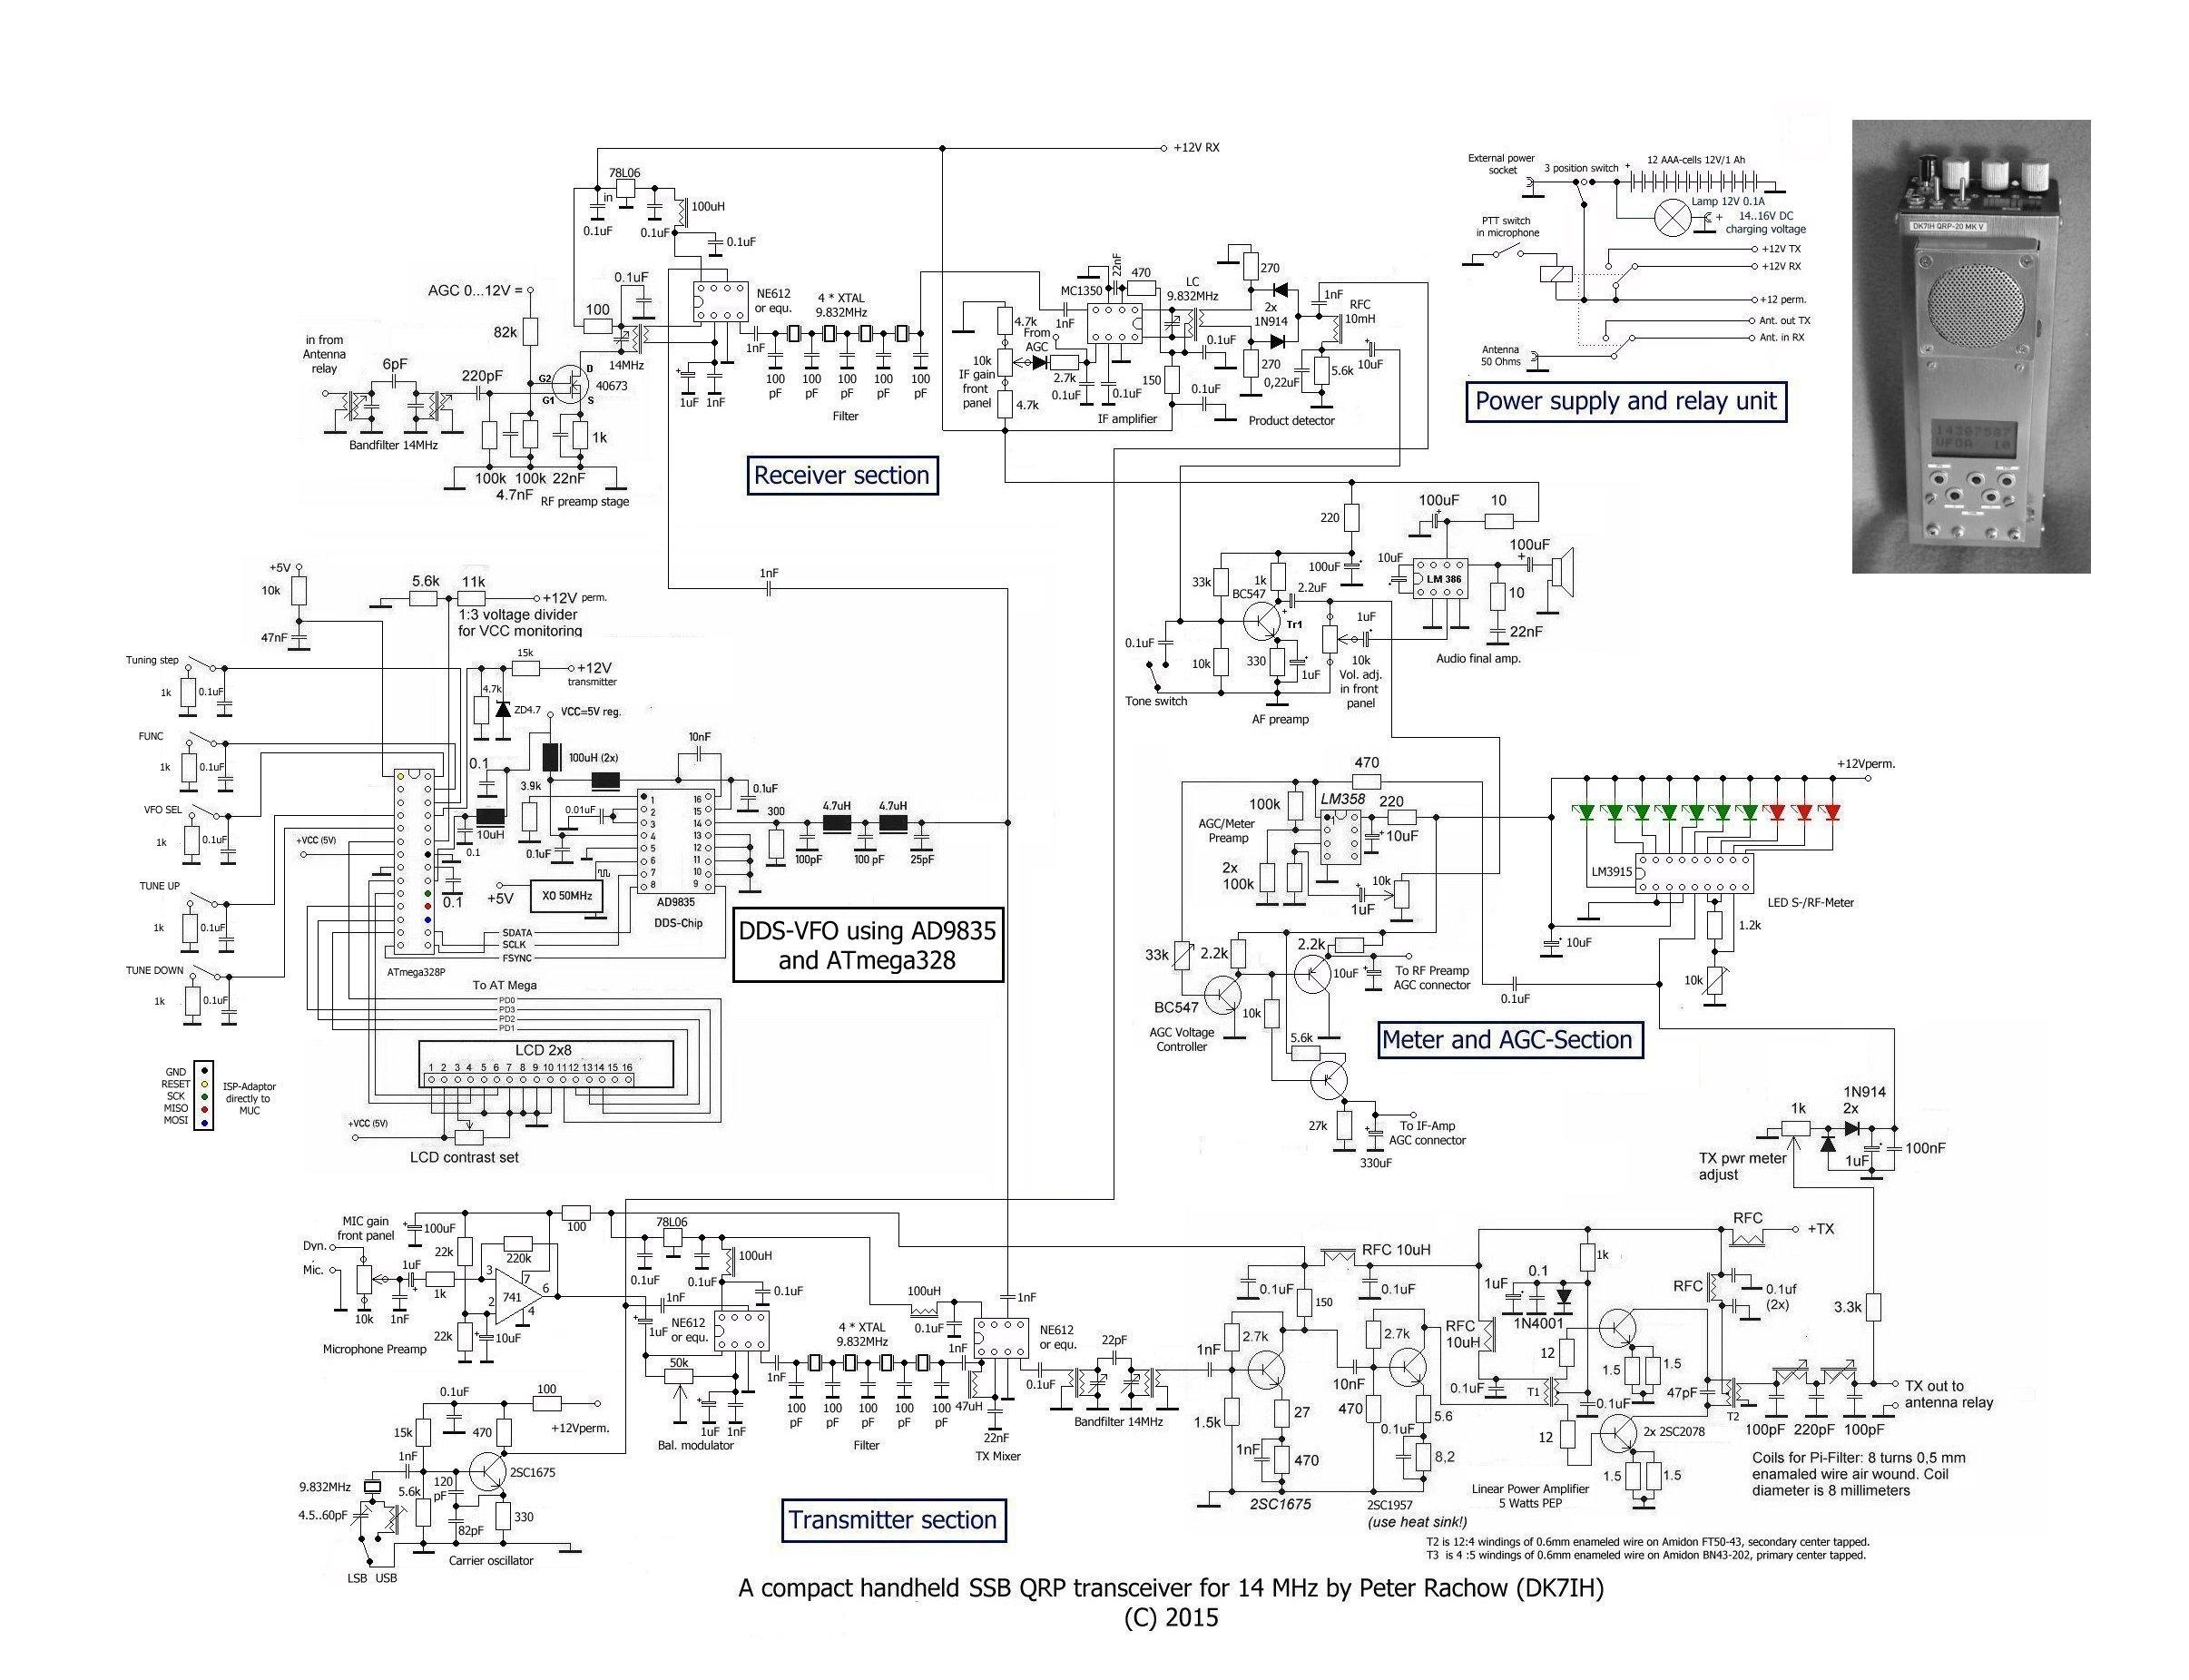 small resolution of handheld radio diagram wiring diagrams the errata schematic of 14 mhz handheld transceiver revised amateur handheld